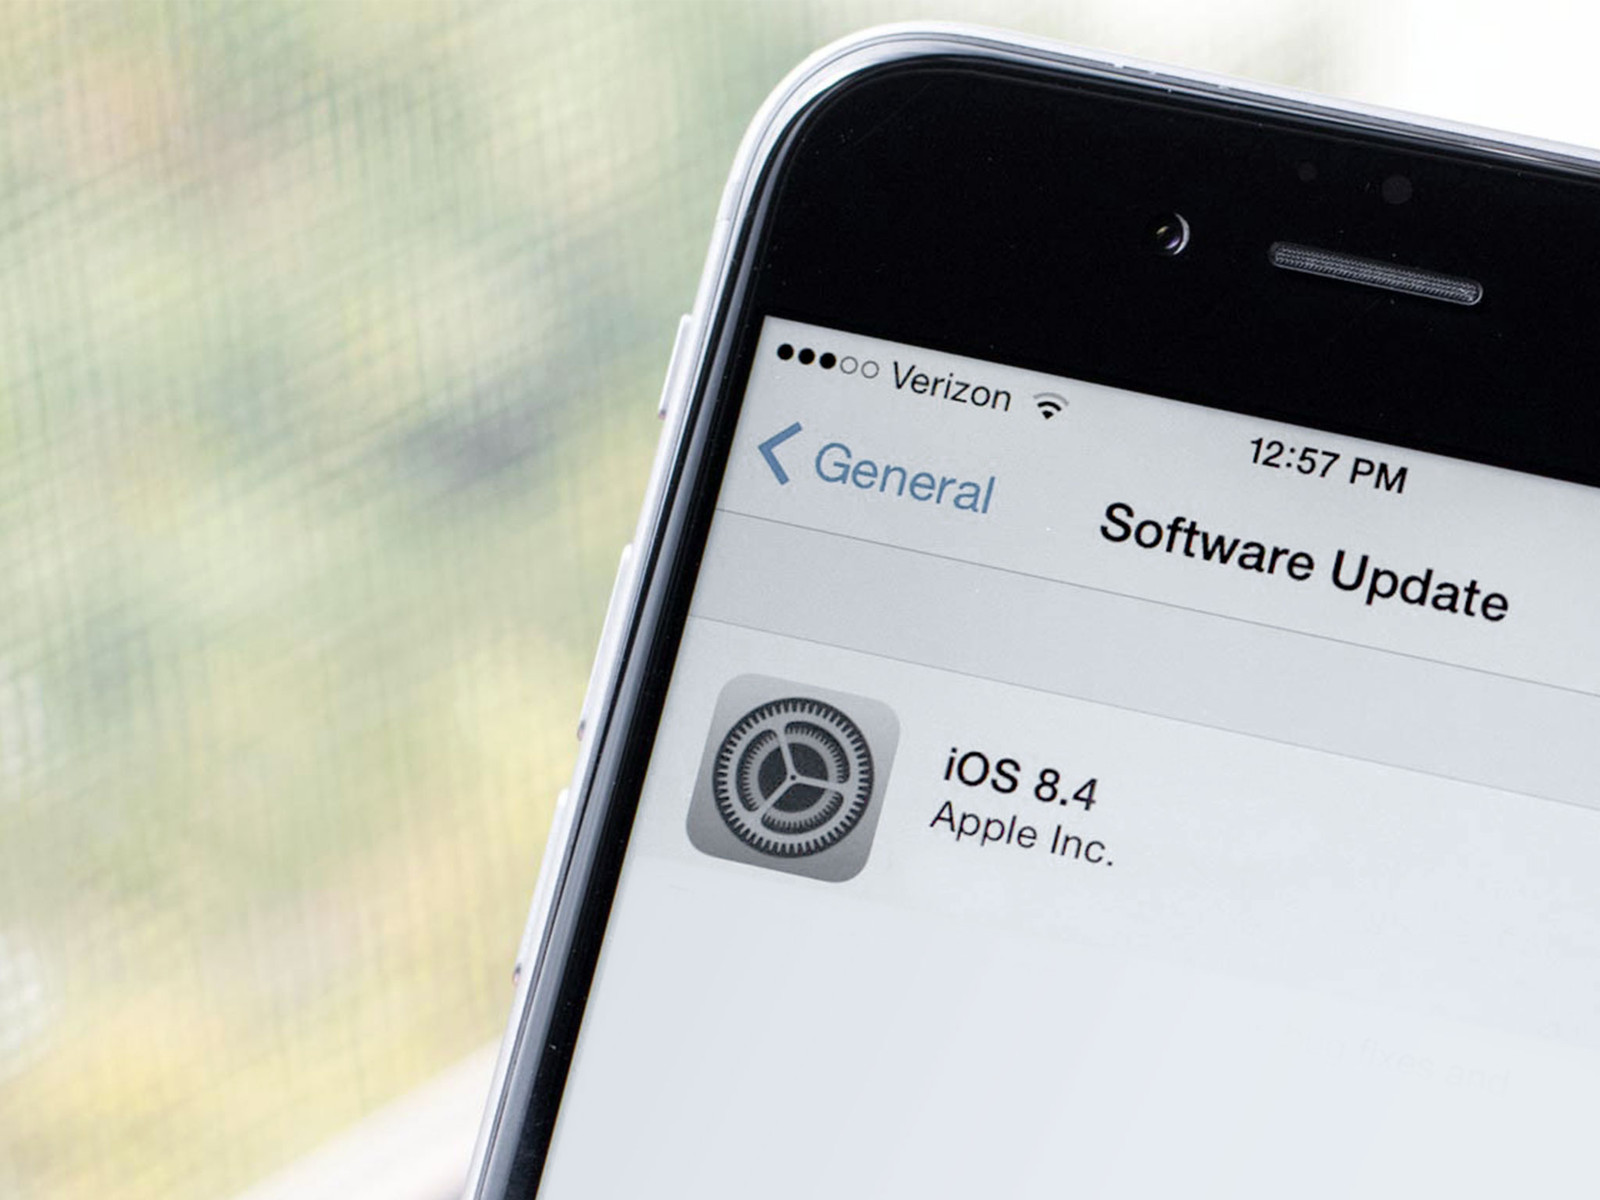 iphone5 2 8 4 1 downgrade windows tenlua fshare sha1 iphone5 2 8 4